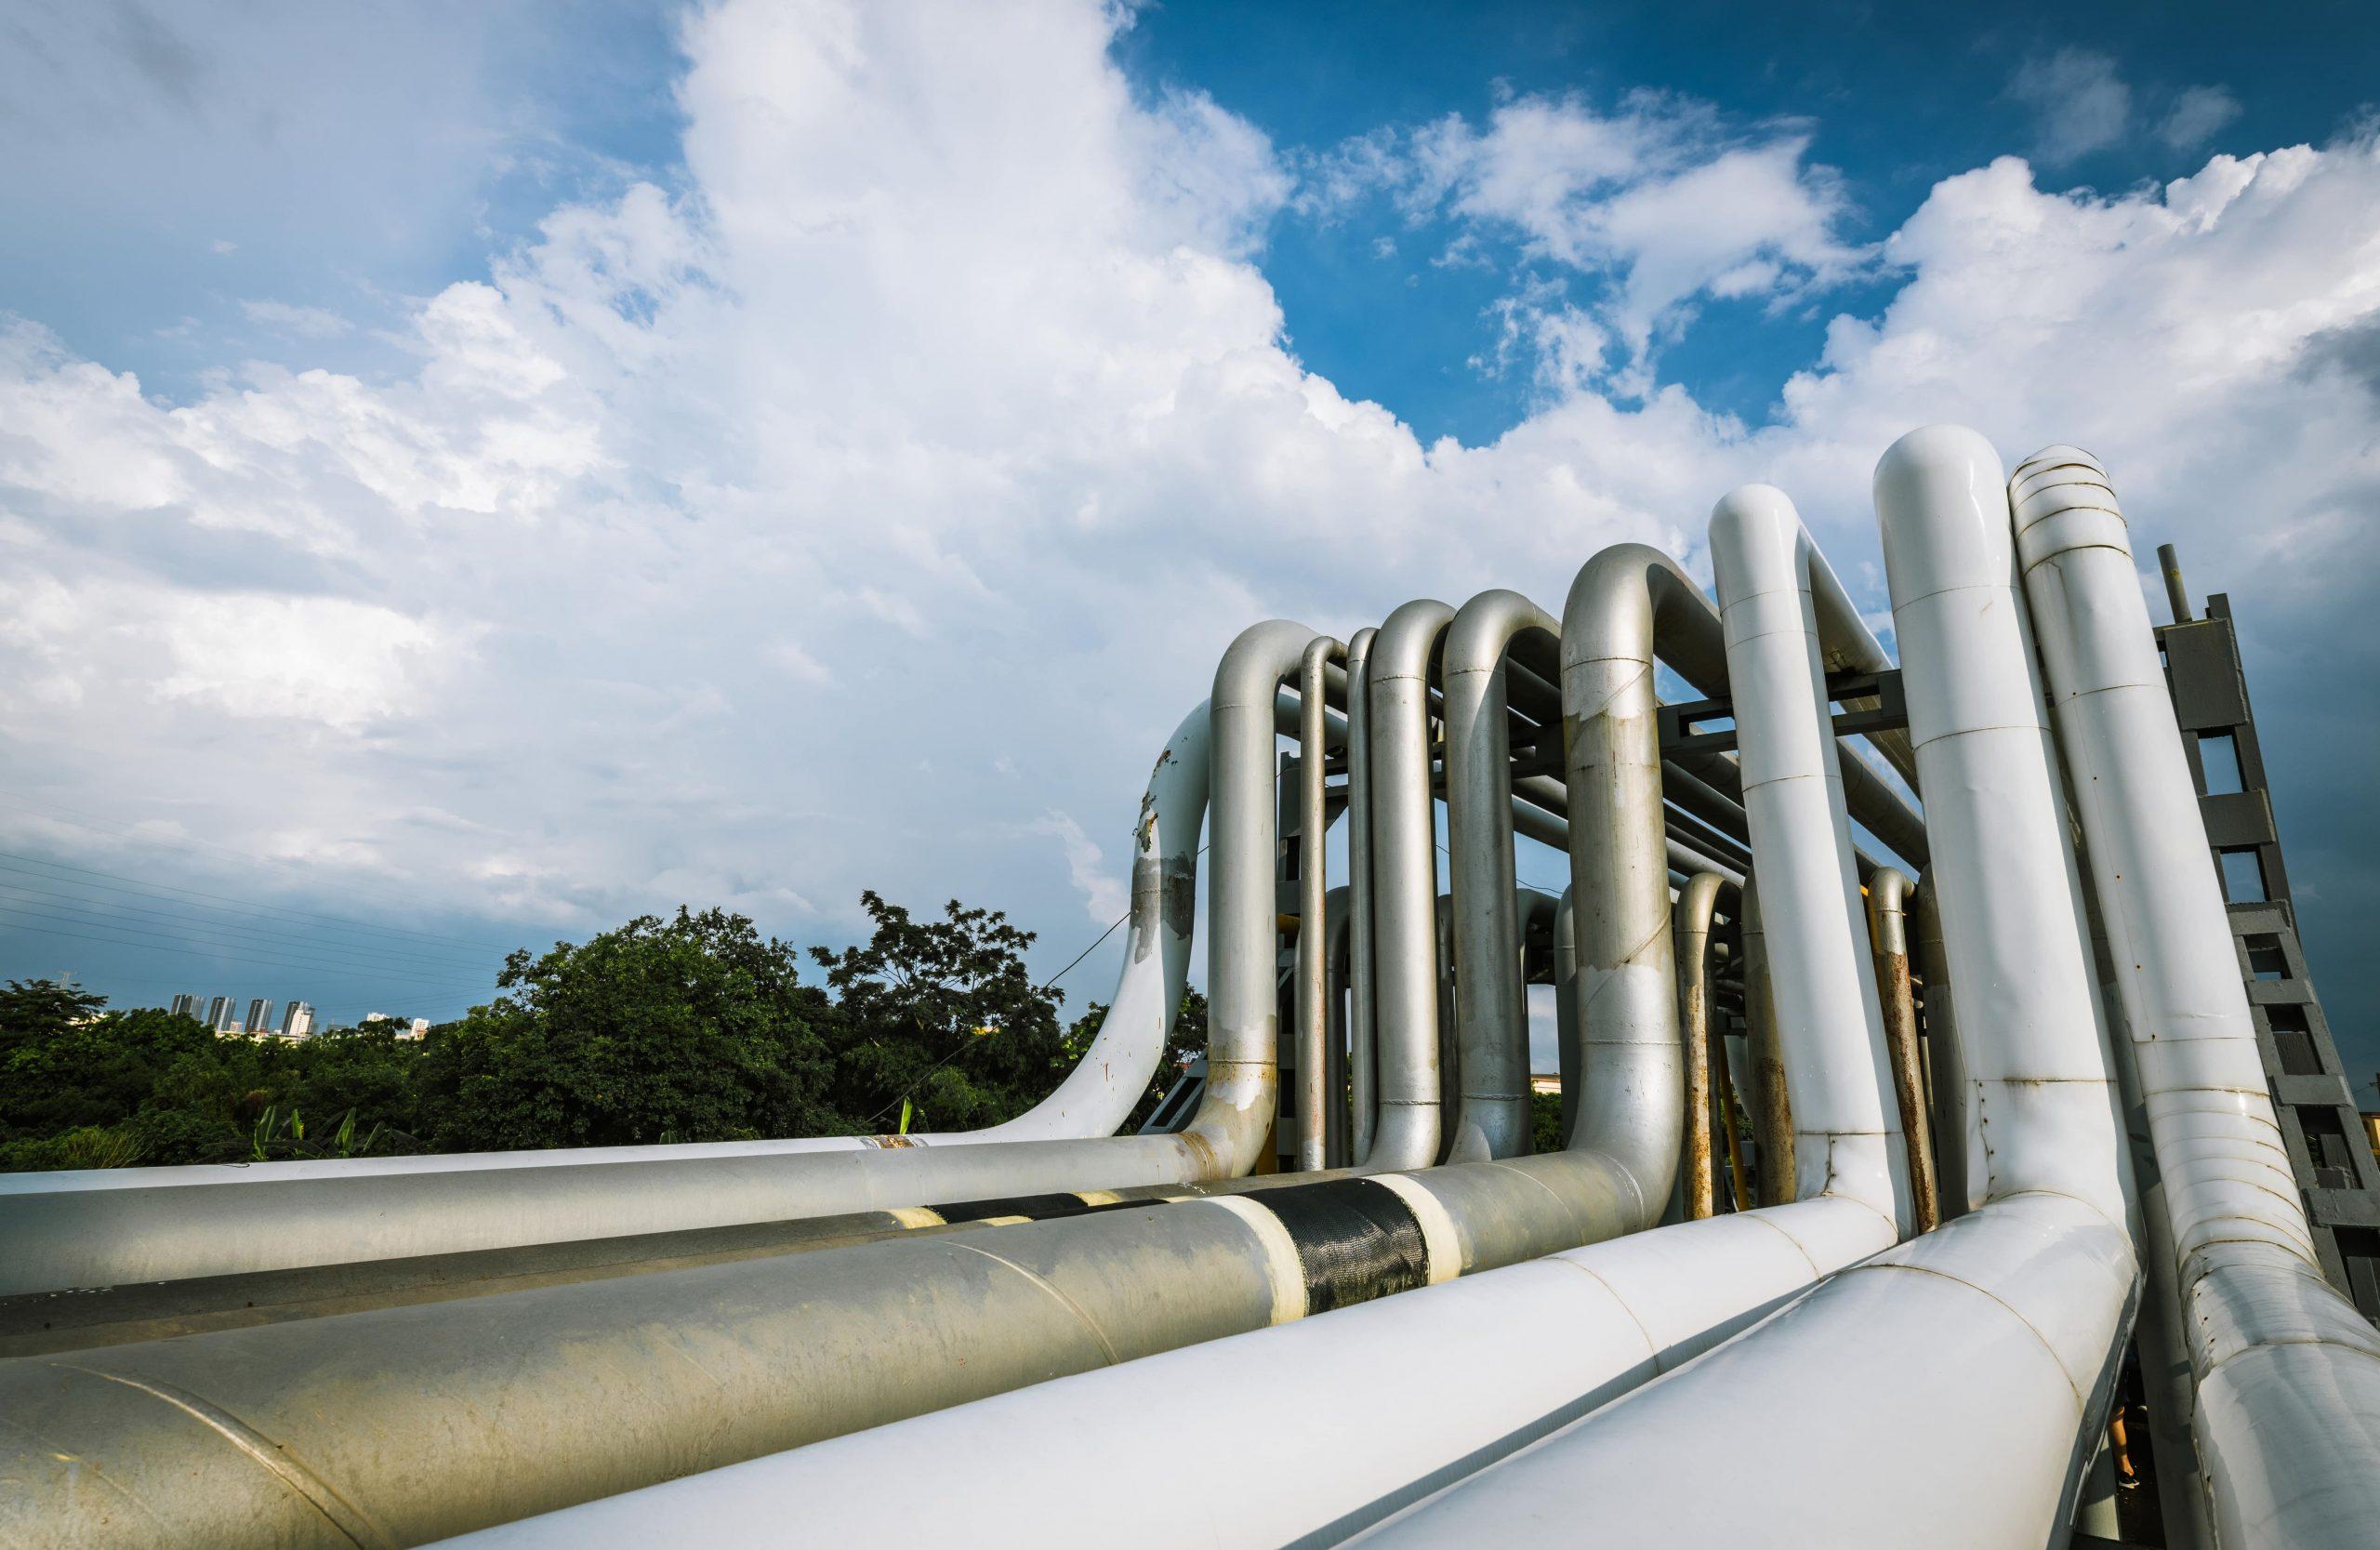 oil-pipeline-9WNMKVM